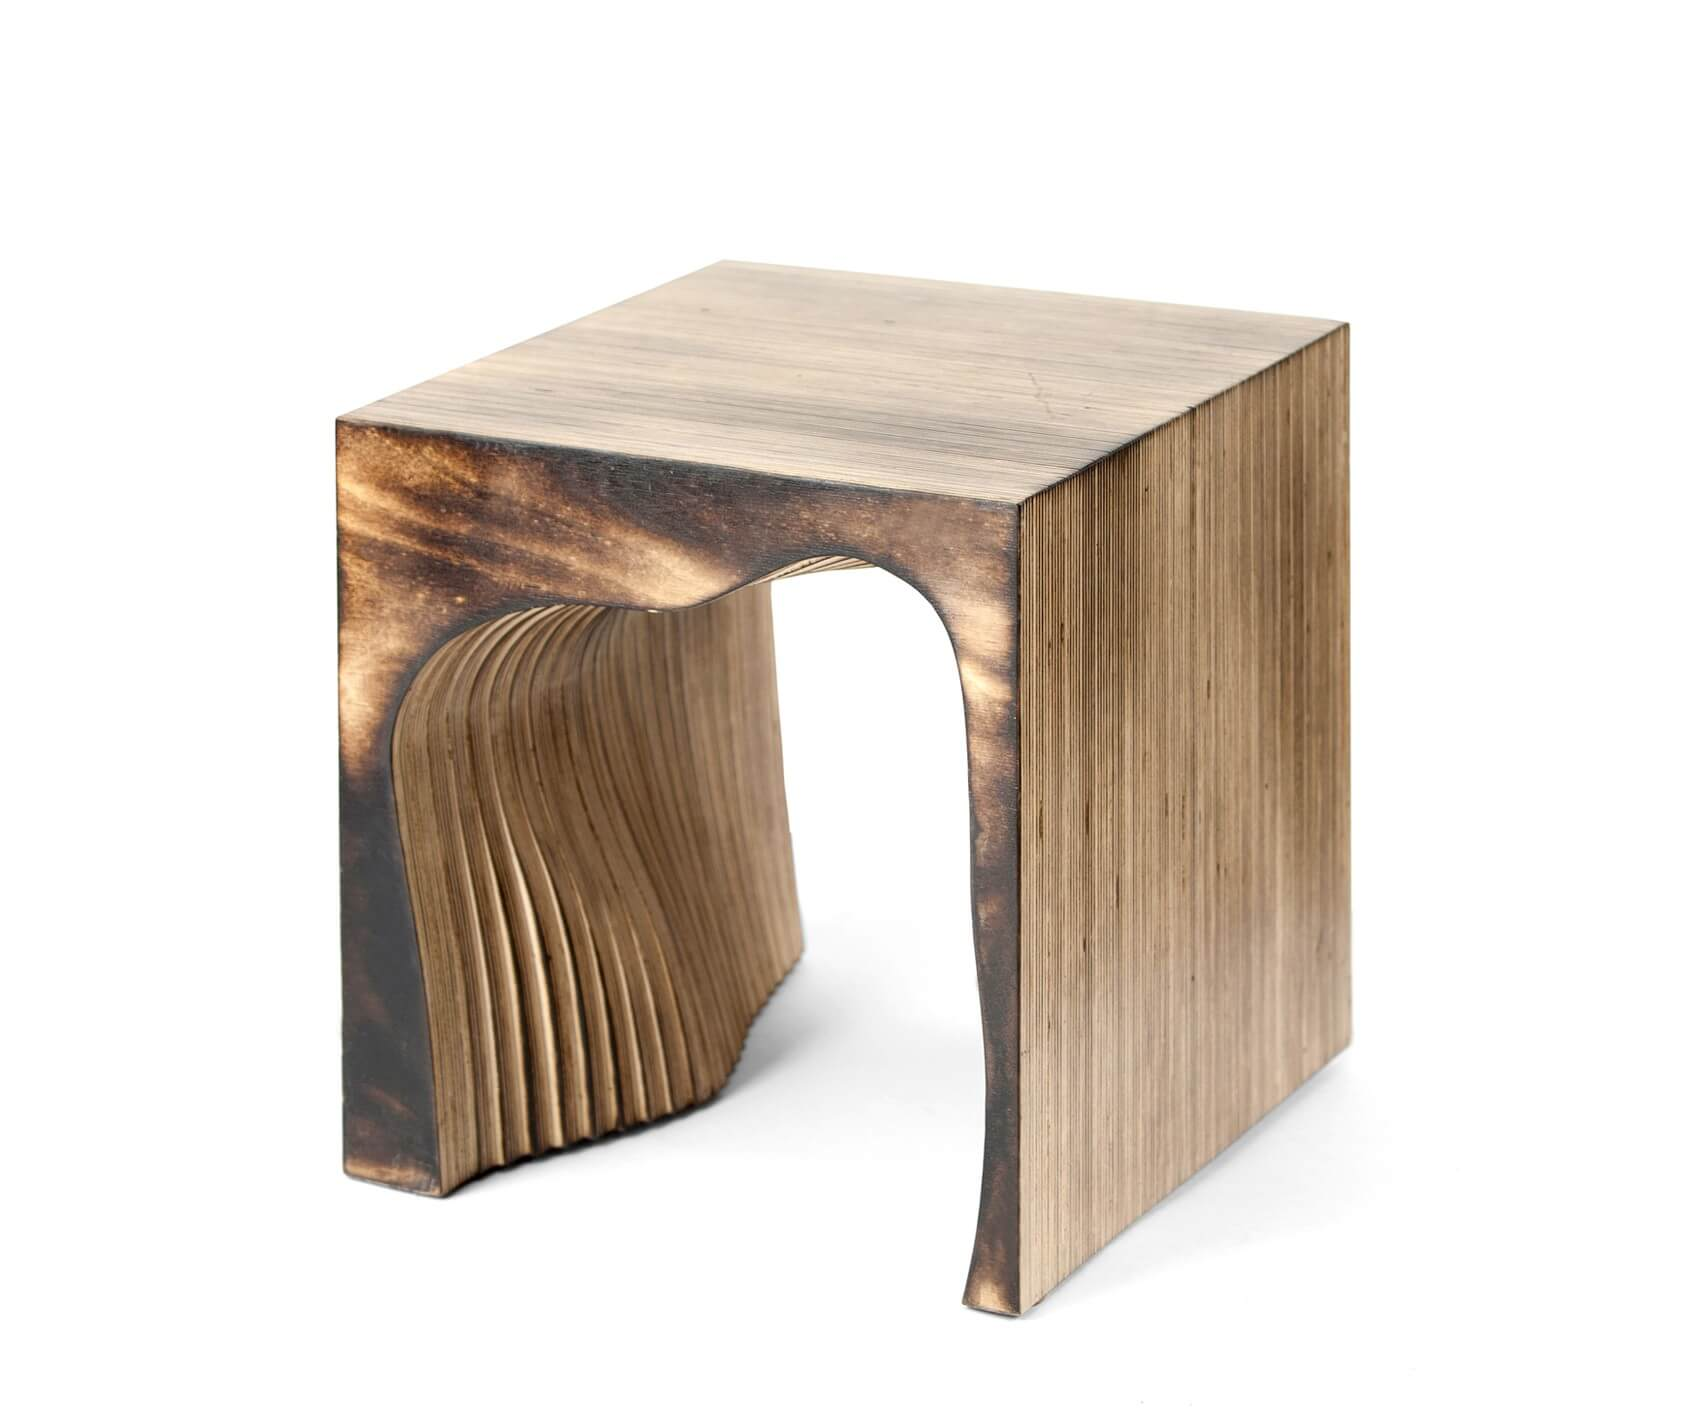 дизайнерский табурет из дерева